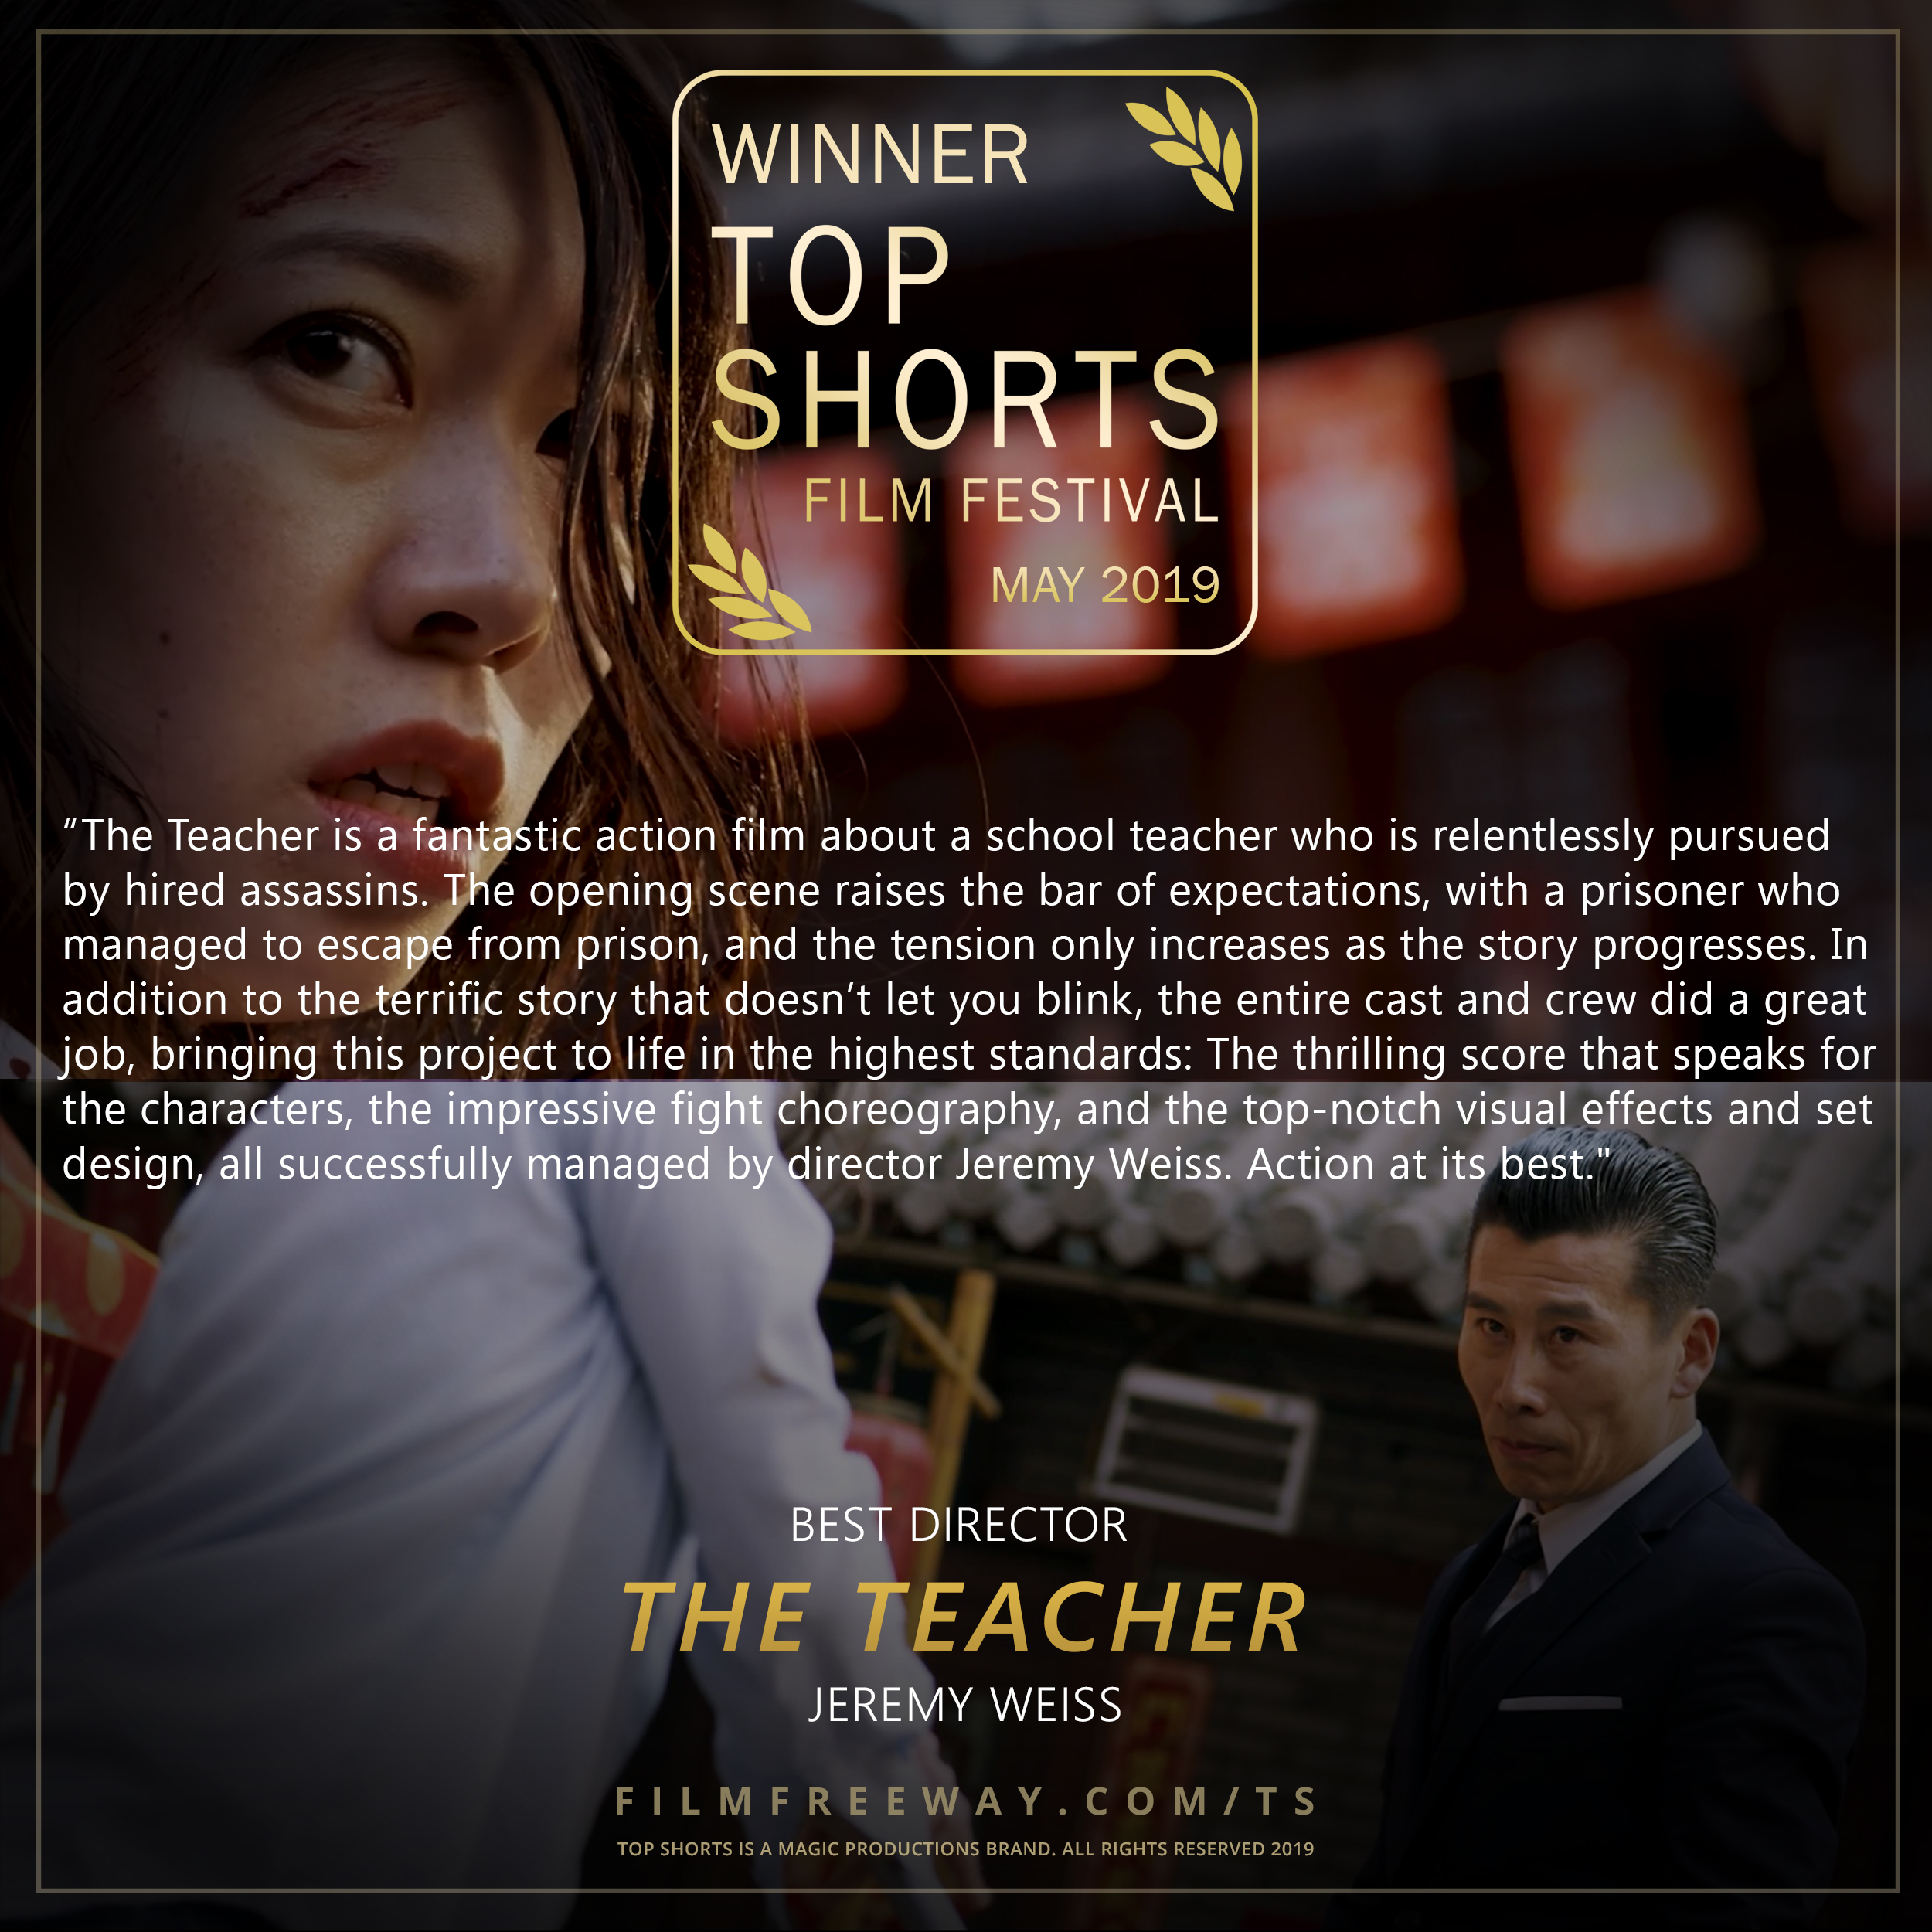 THE TEACHER design